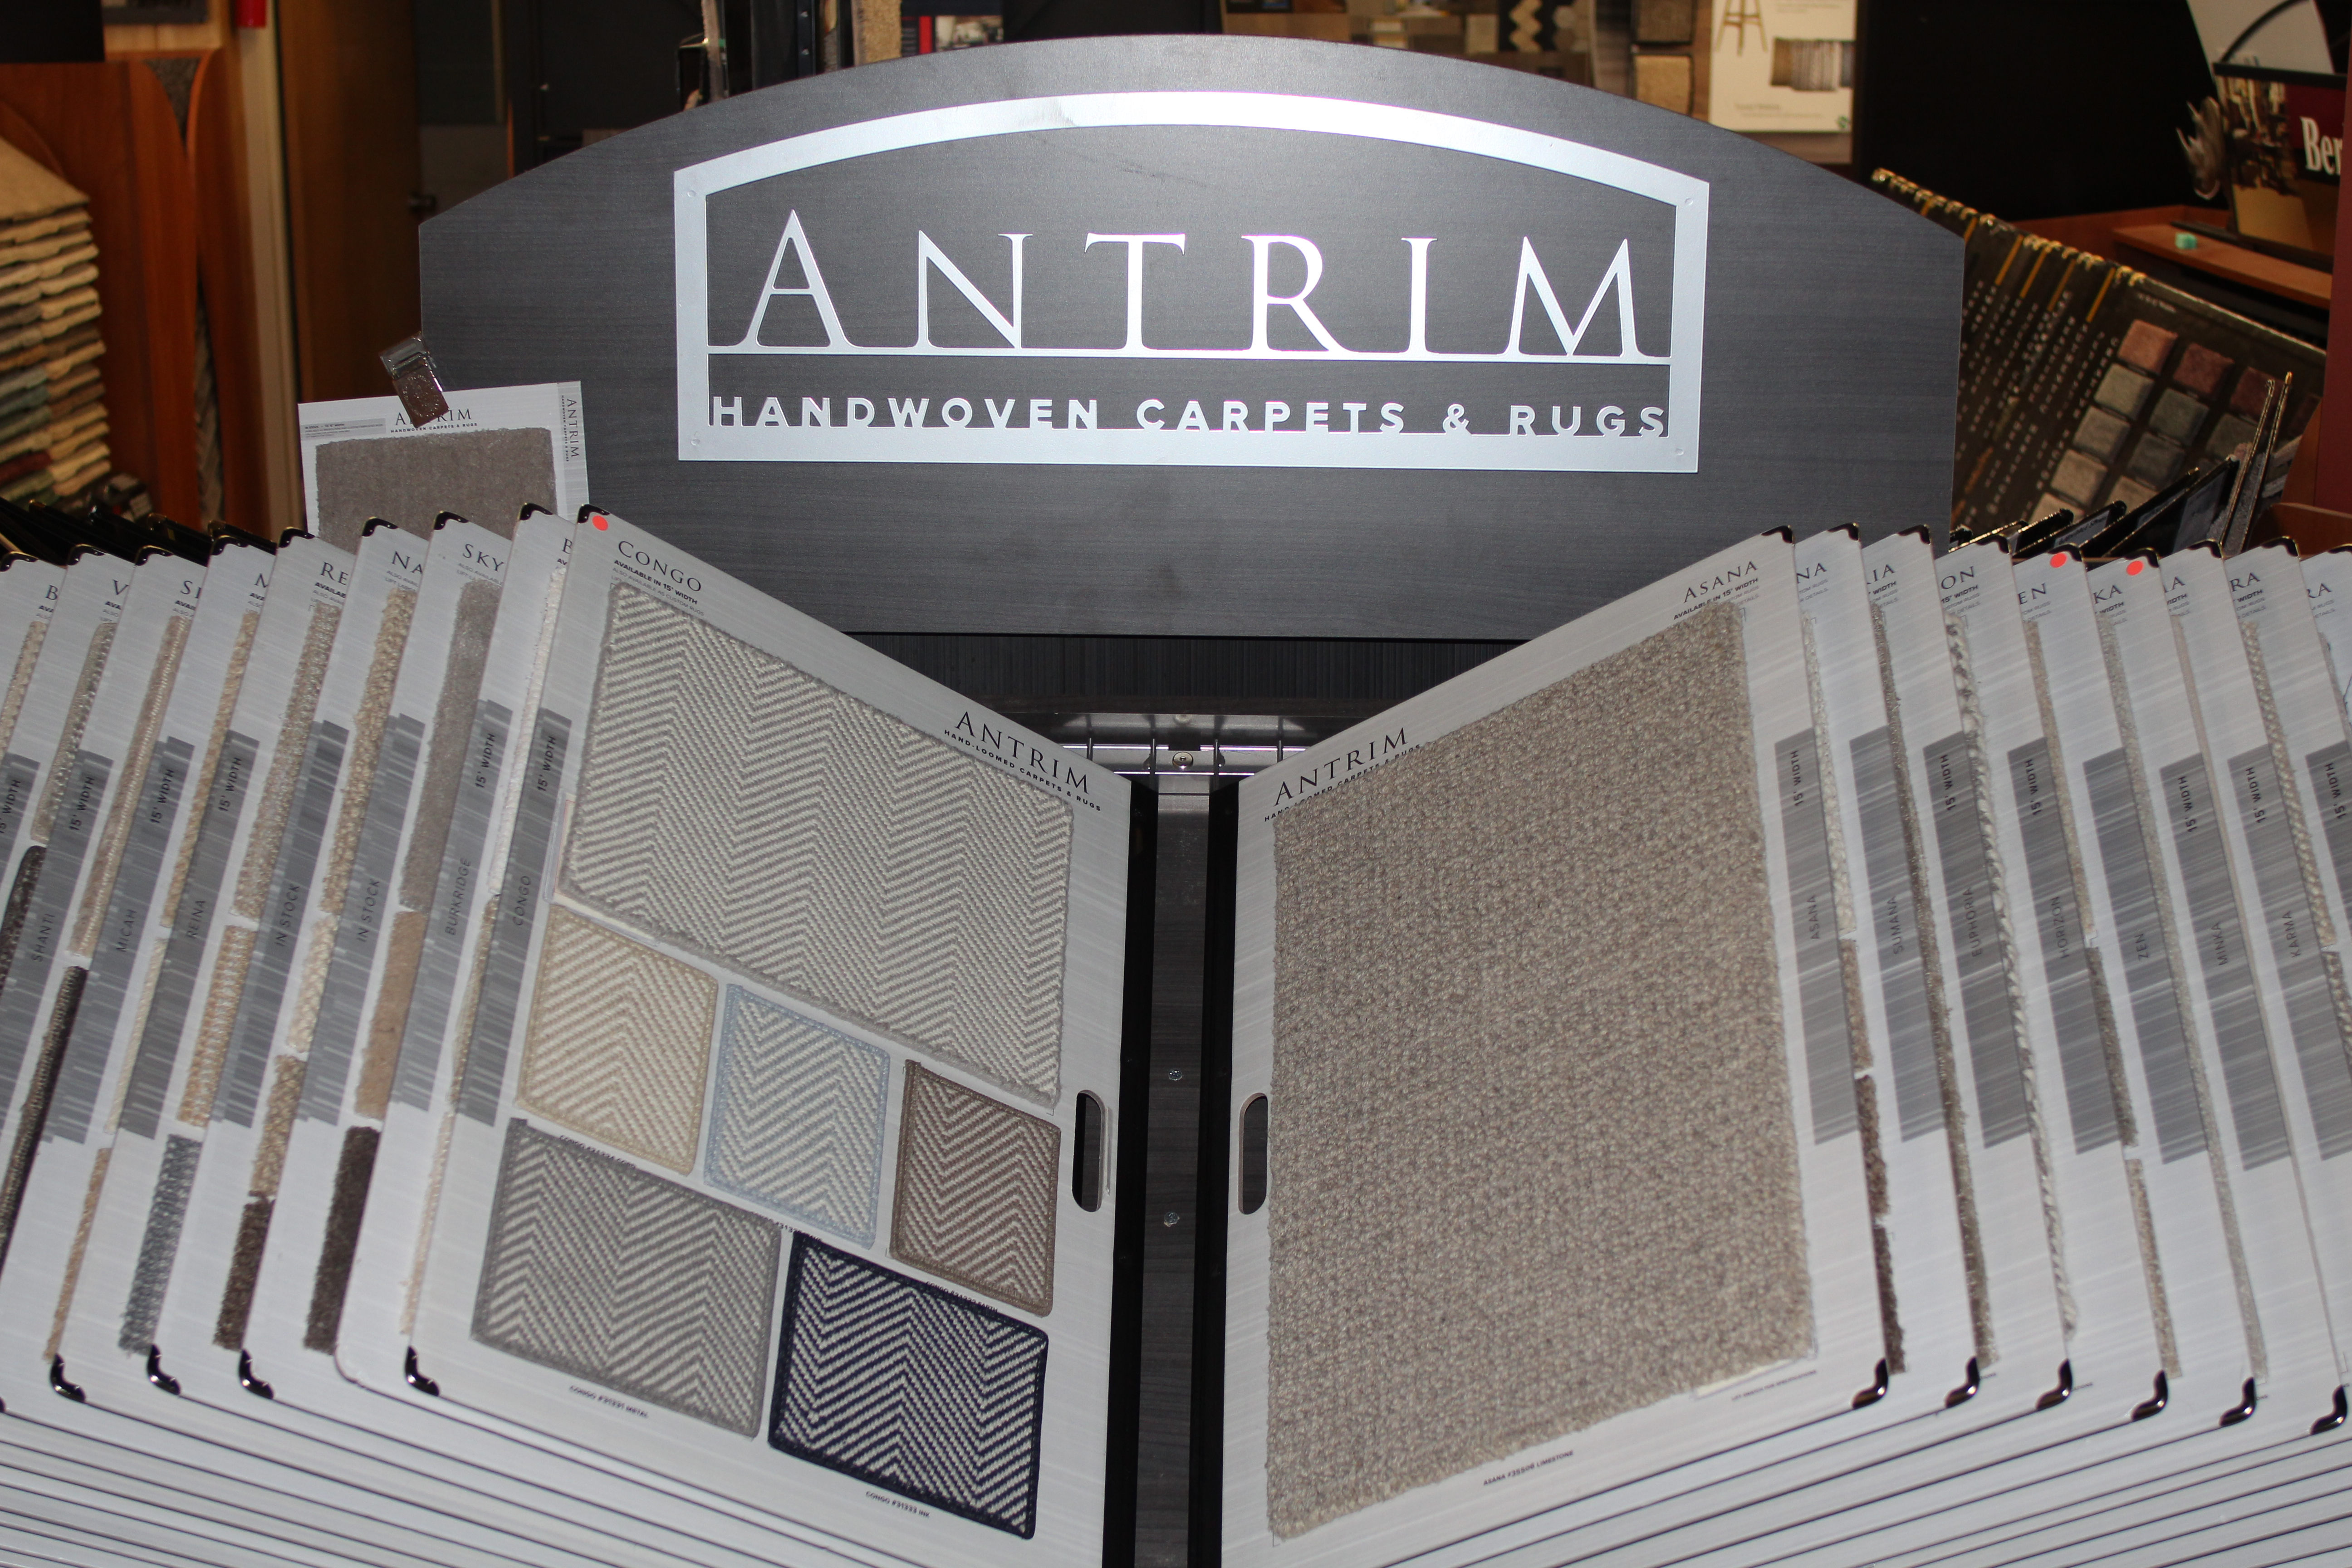 Antrim Handwoven Carpets & Rugs